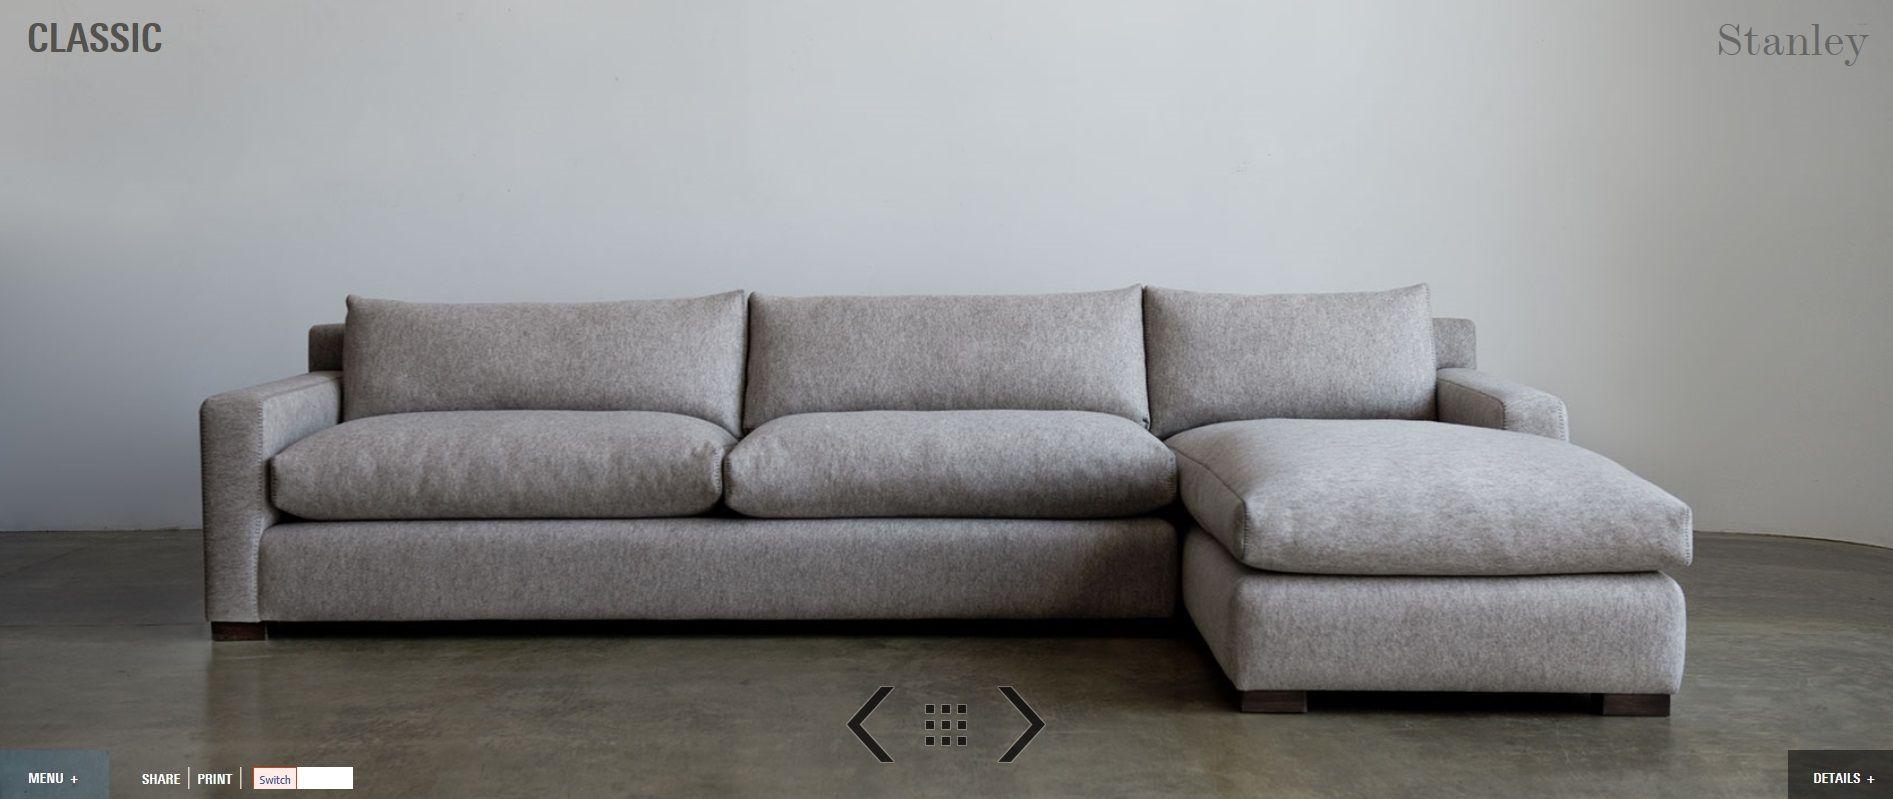 stanley sofa leggett platt air dream replacement sleeper mattress by montauk a family canadian company